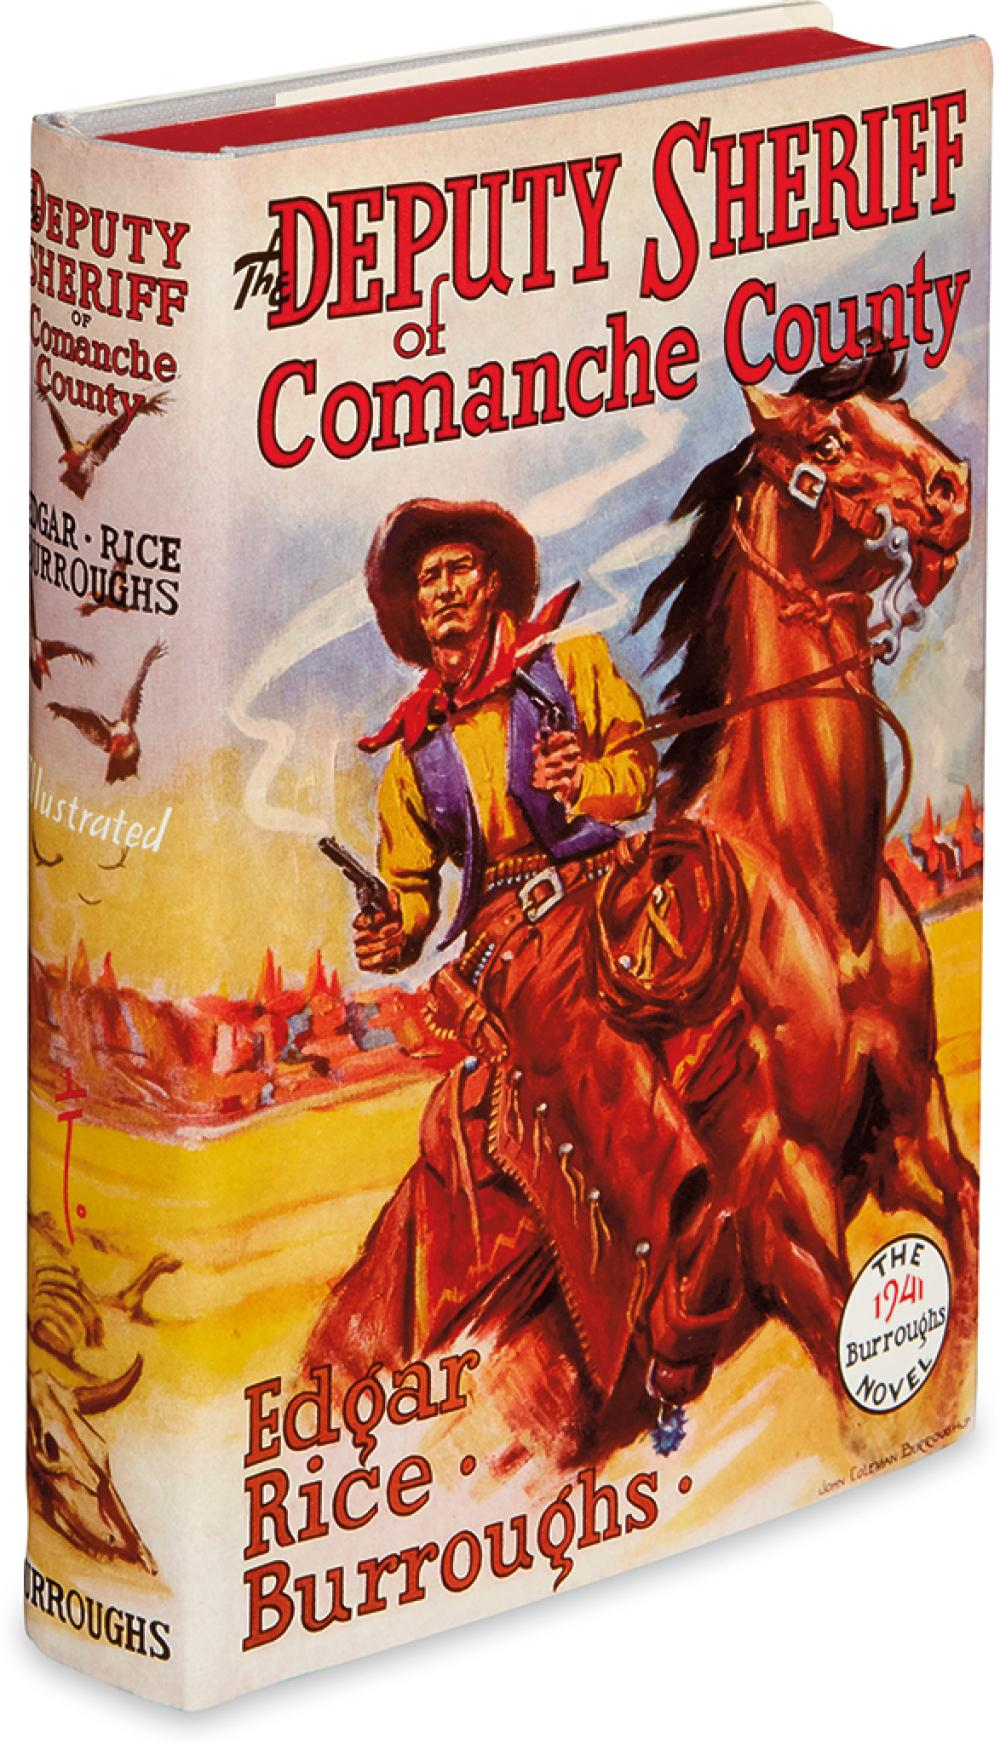 BURROUGHS, EDGAR RICE. Deputy Sheriff of Comanche County.